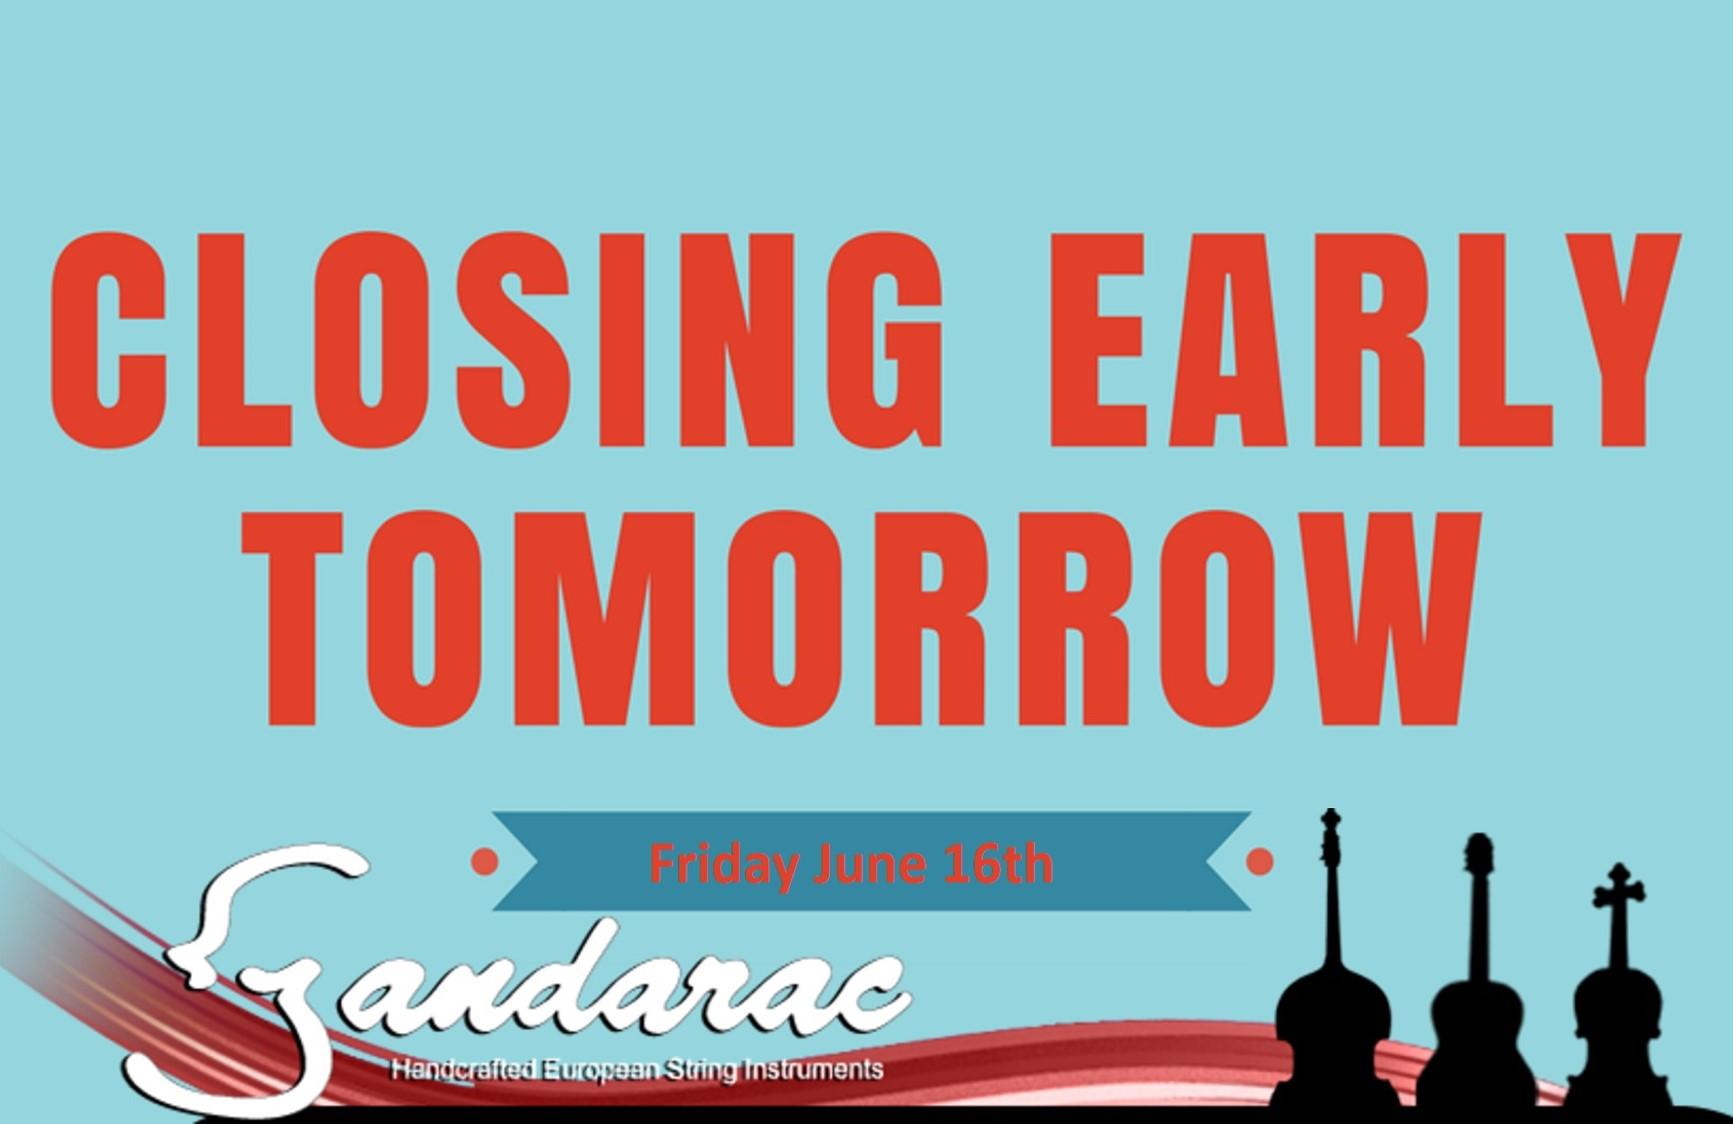 15 - closing early tomorrow